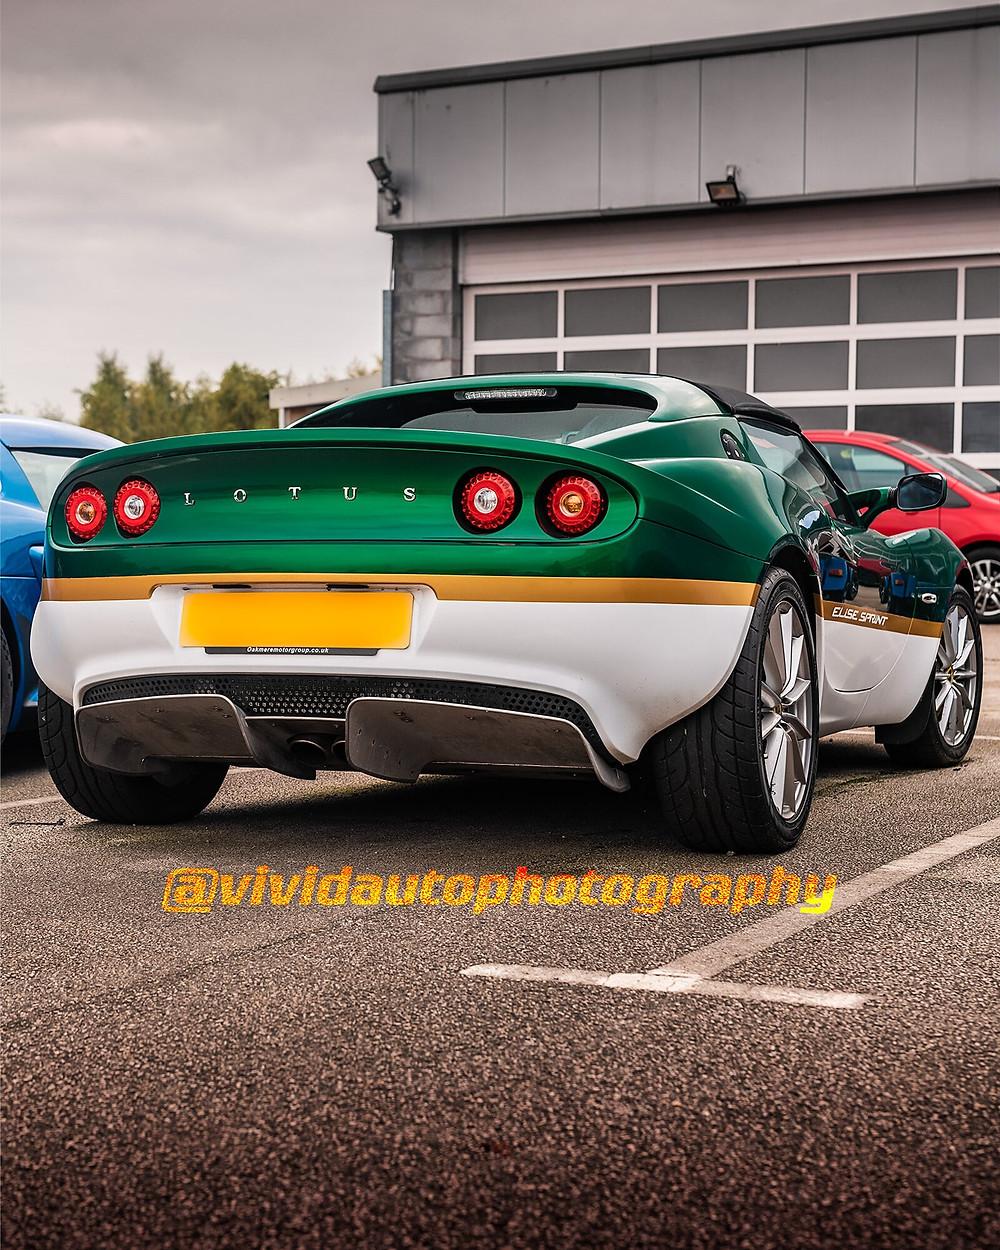 Lotus Elise Sprint S3 | British Racing Green | Rear three quarter poster